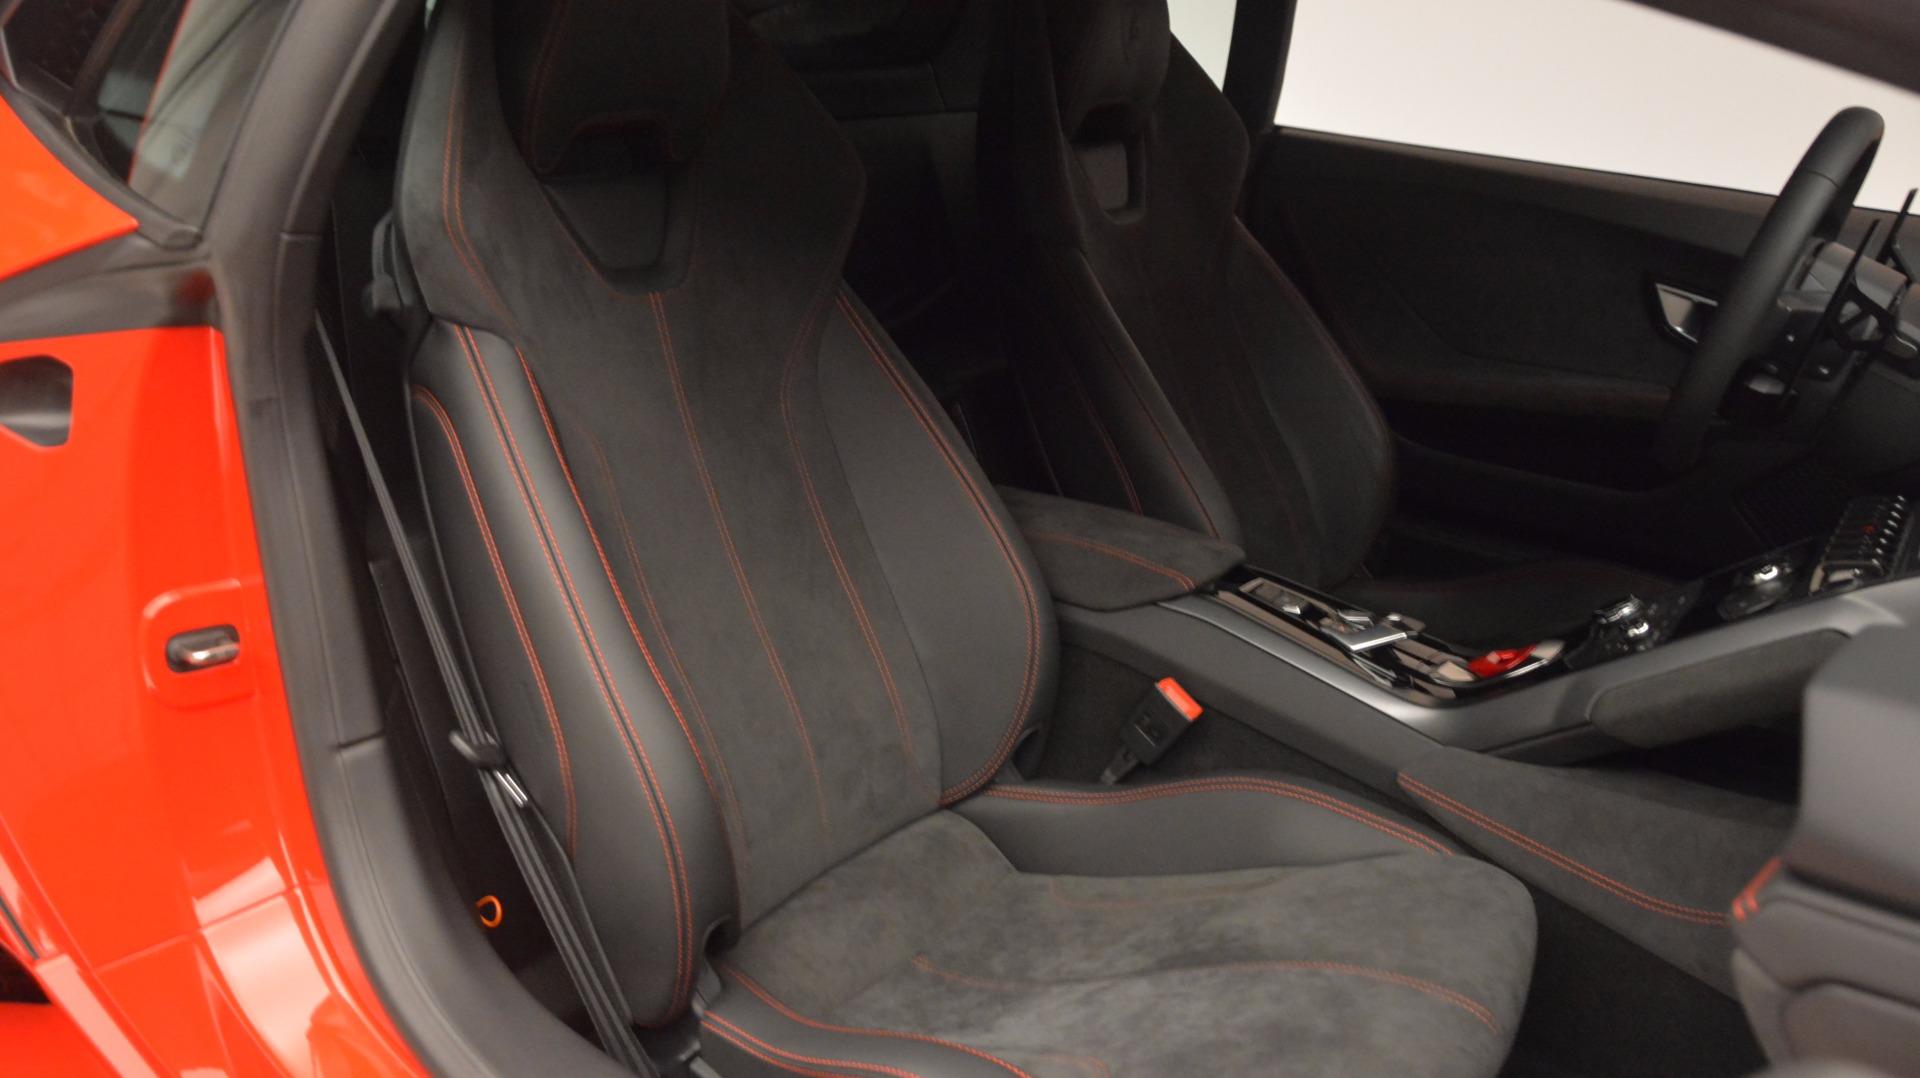 Used 2016 Lamborghini Huracan LP 580-2 For Sale In Greenwich, CT. Alfa Romeo of Greenwich, 7184 1070_p31